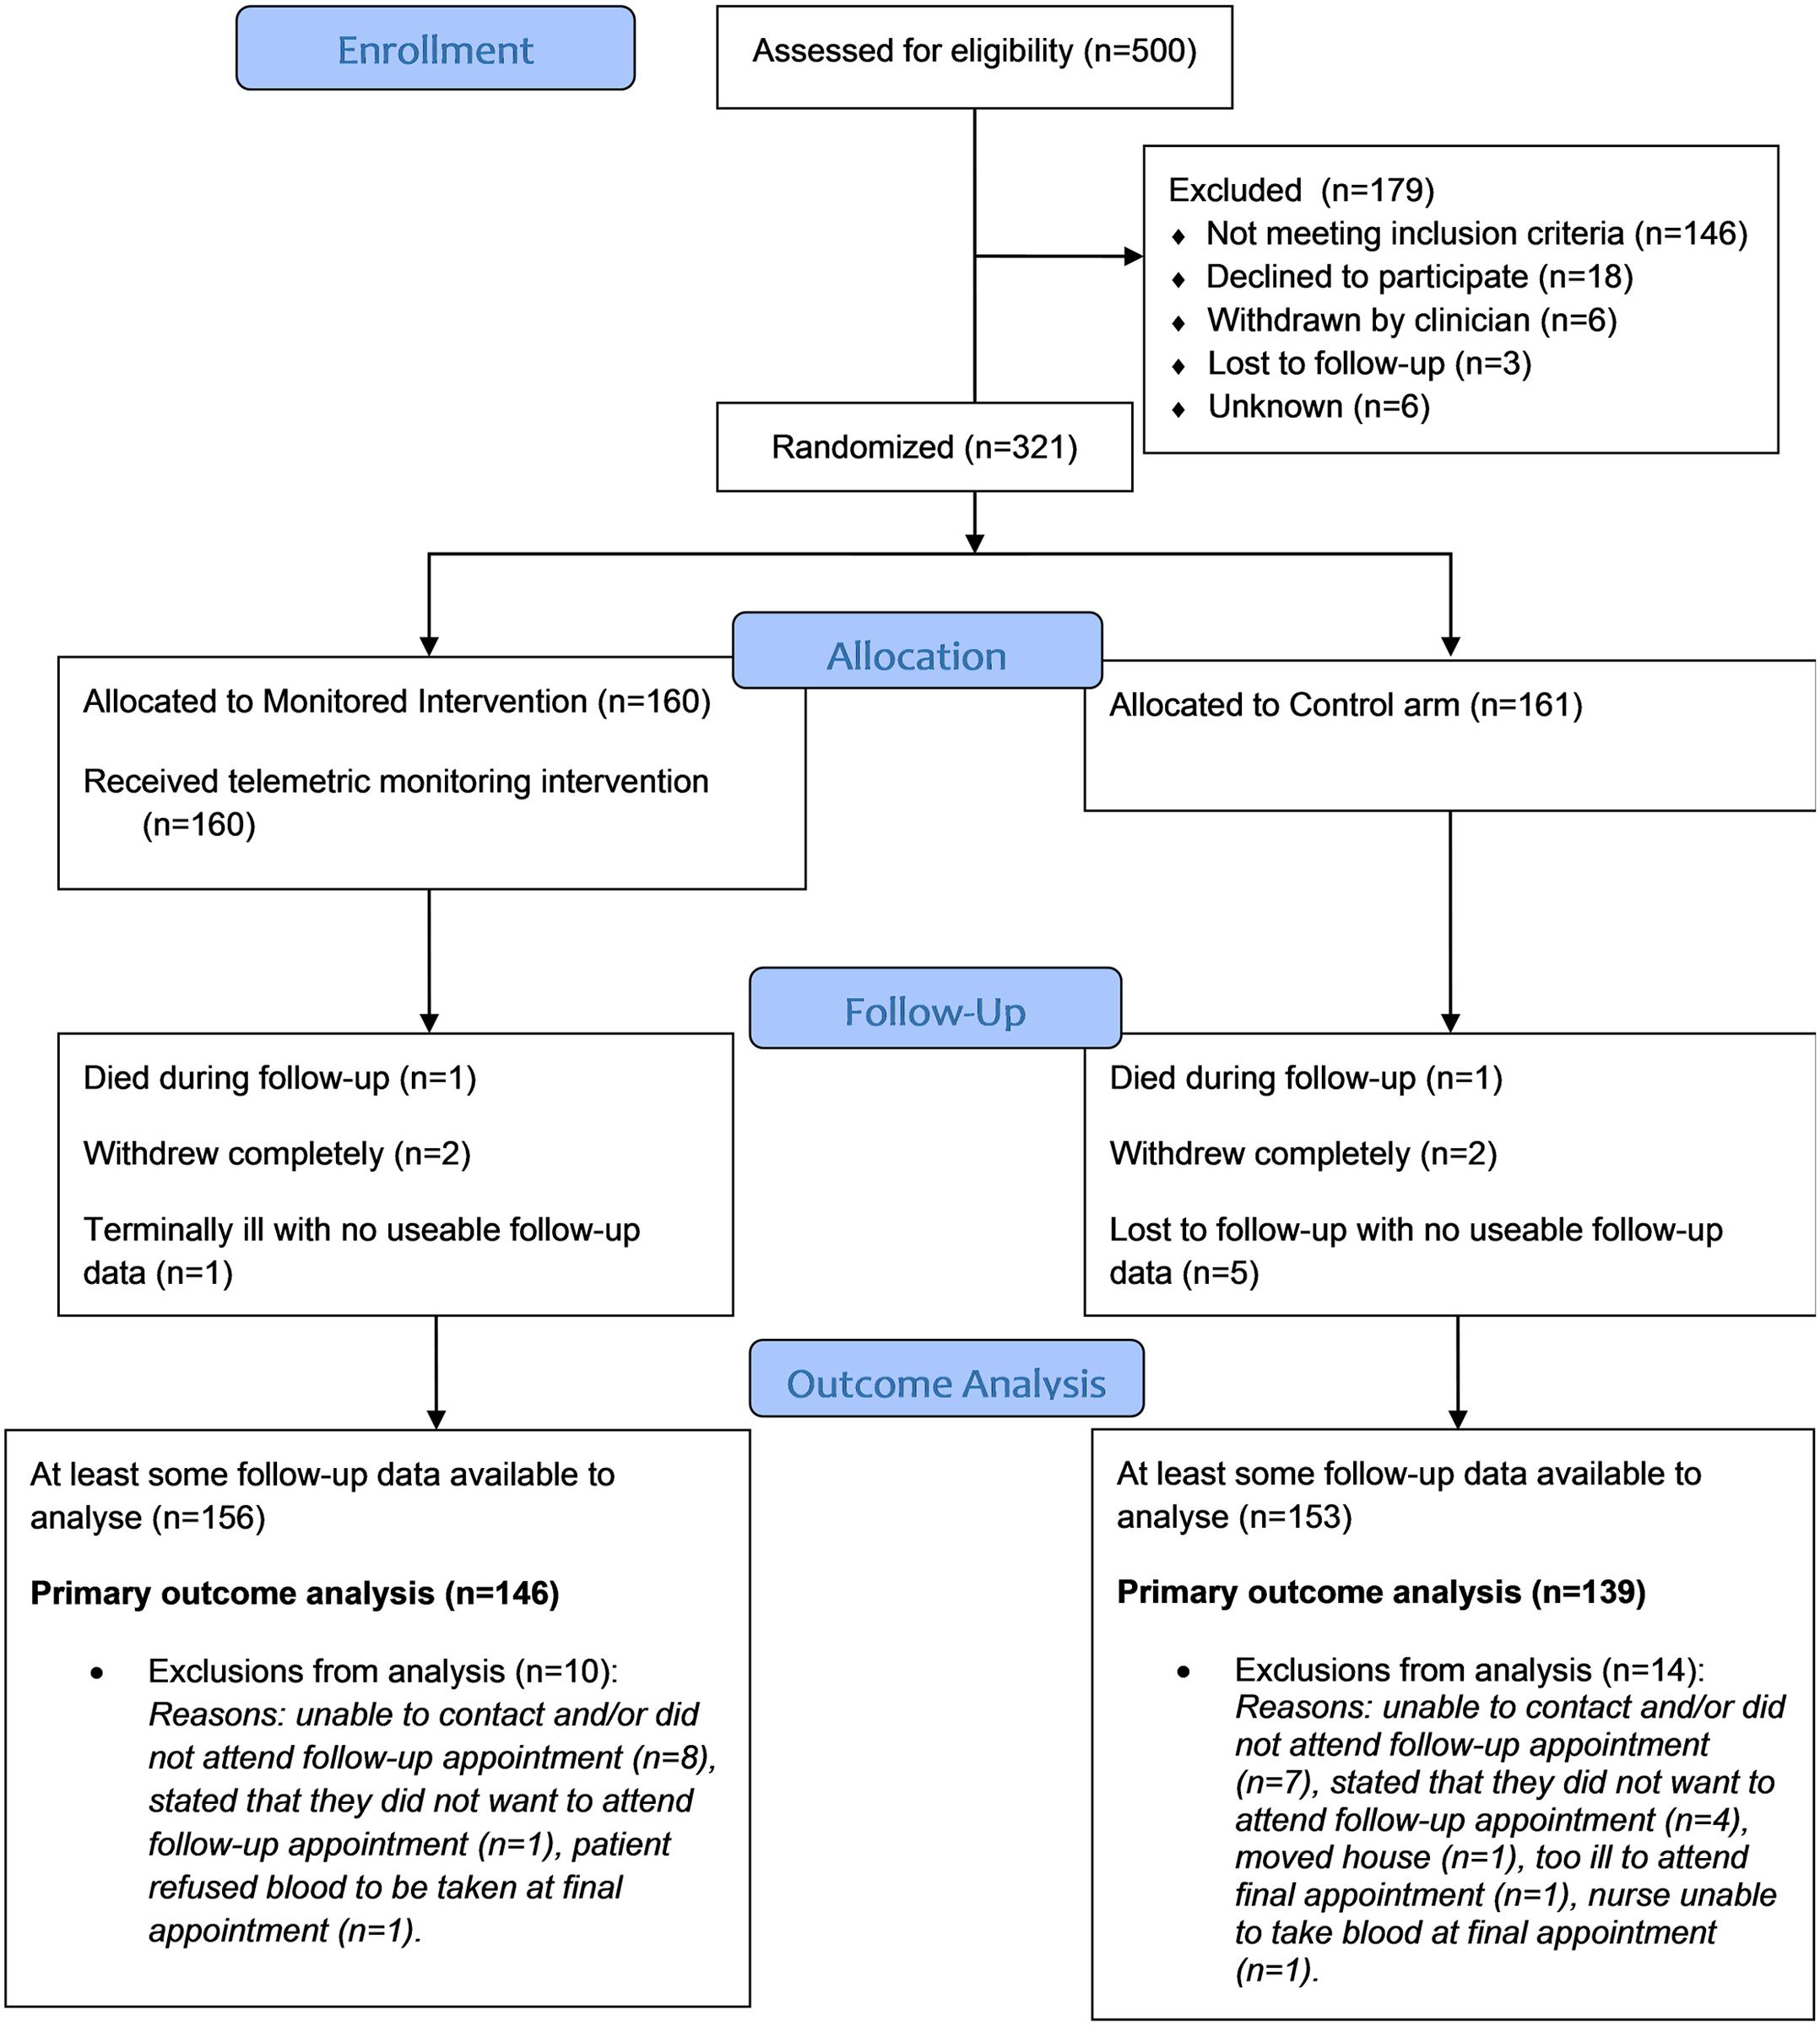 CONSORT flow chart for the Telescot diabetes trial.